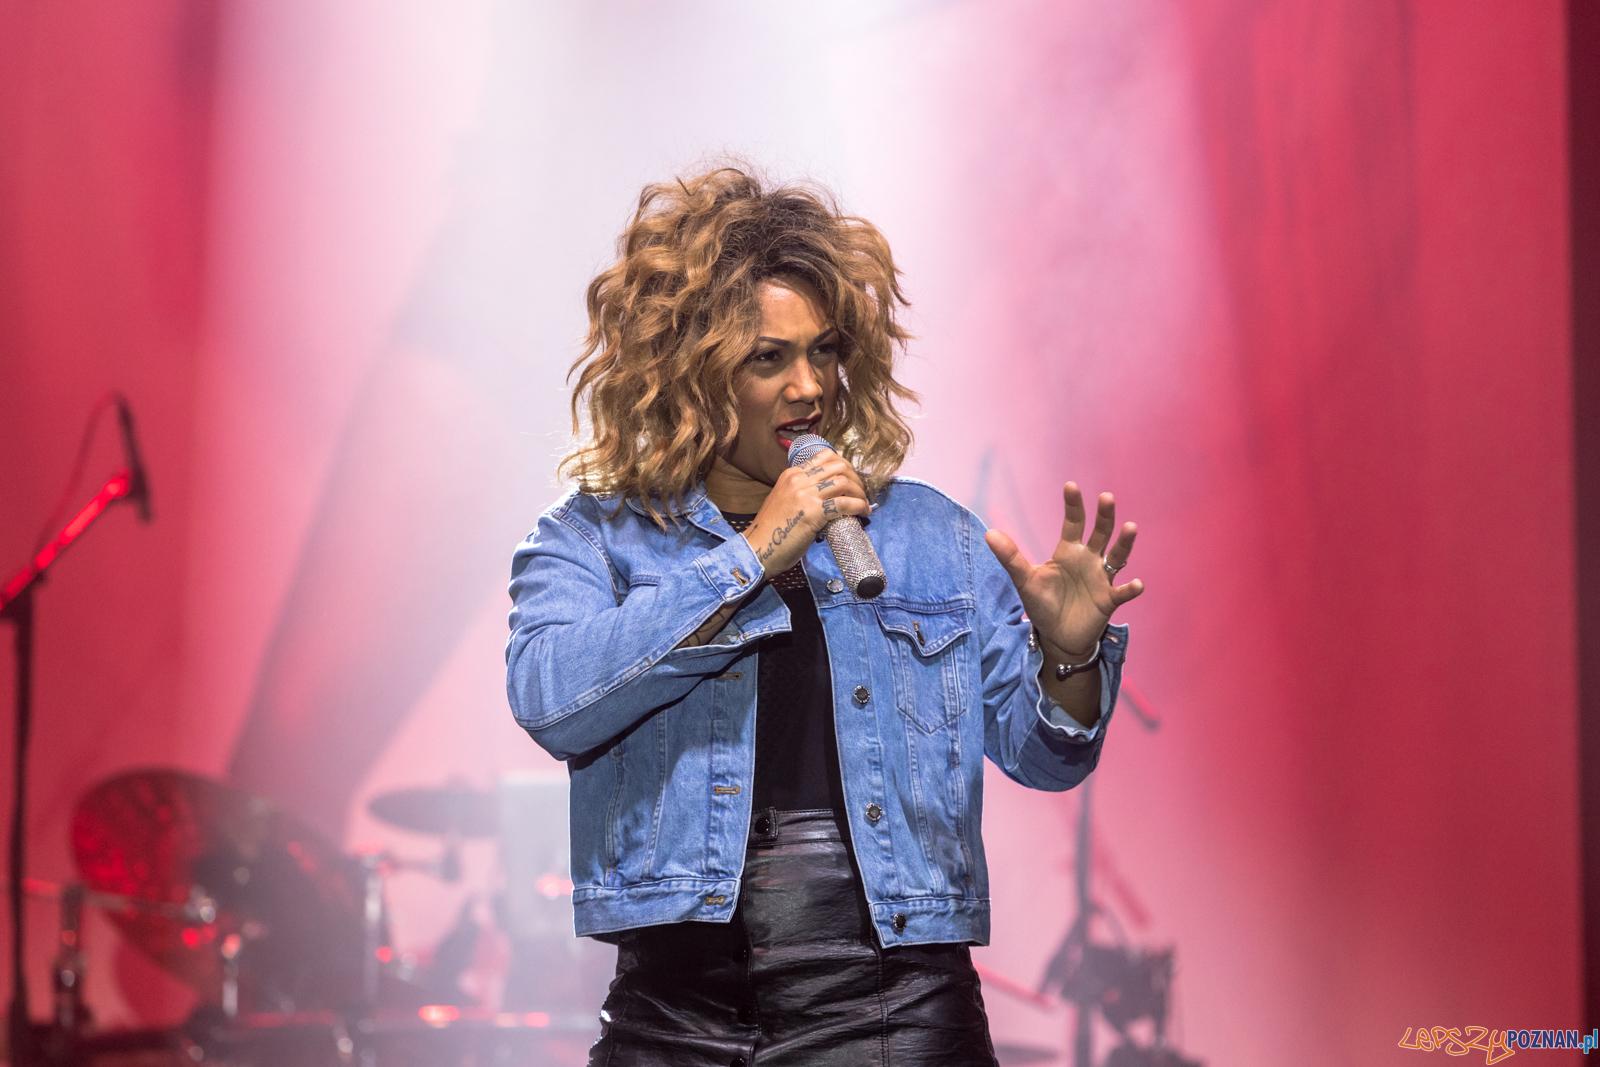 Tribute to Tina Turner